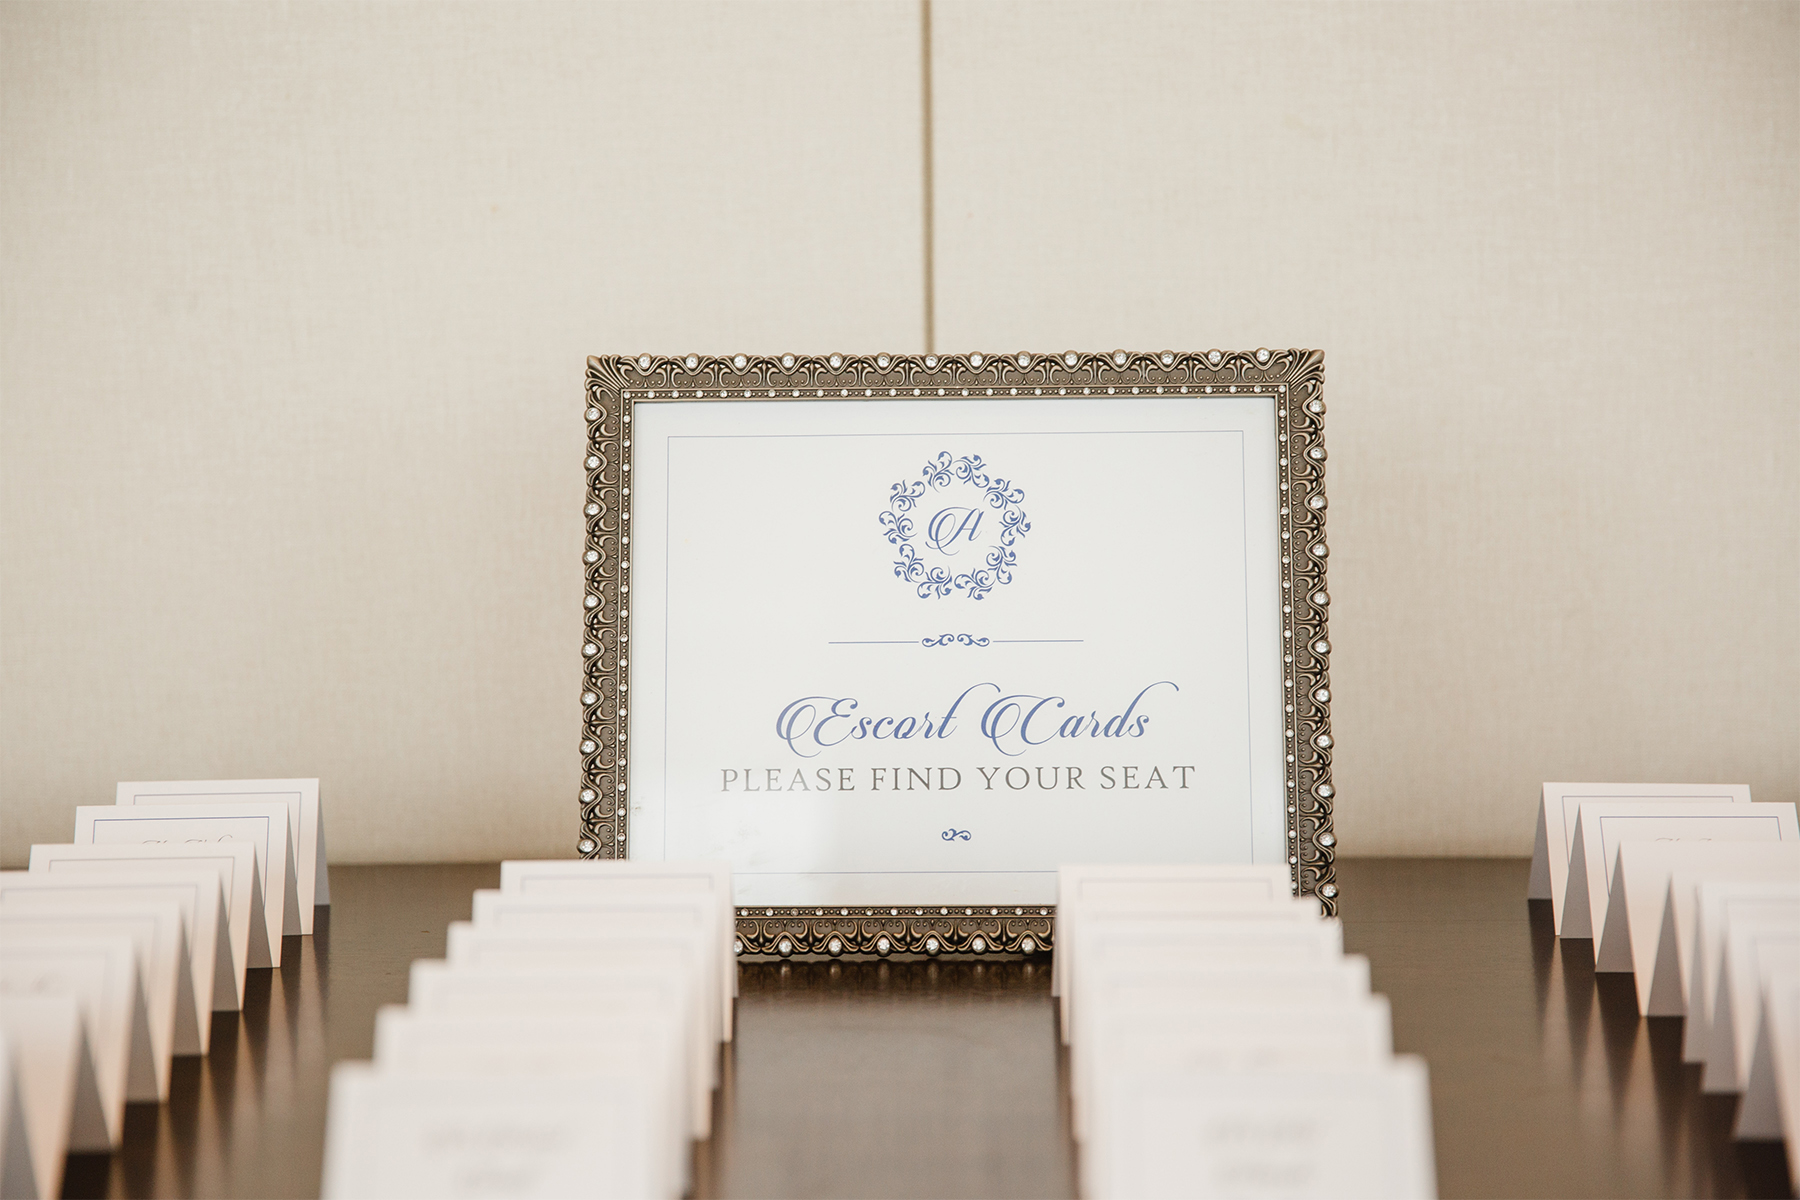 daytoremember.net | Eri Reyna Photography | Wedding Stationery | A Day To Remember Houston Wedding Planning and Design